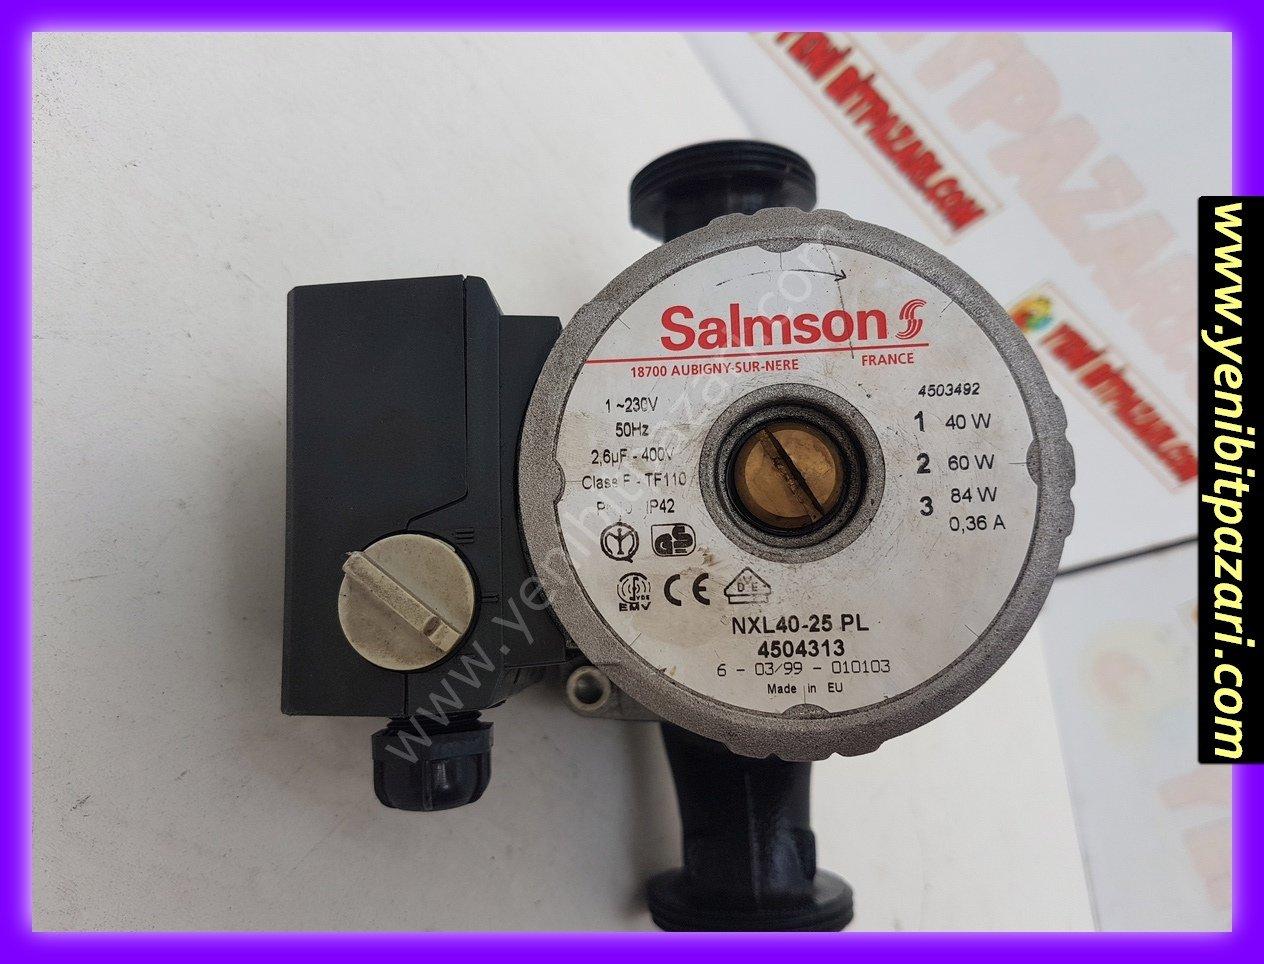 ikinciel salmson 220volt 84w 3 kademeli su pompa devir daim kombi kalorifer sirkulasyon pompasi sorunsuz